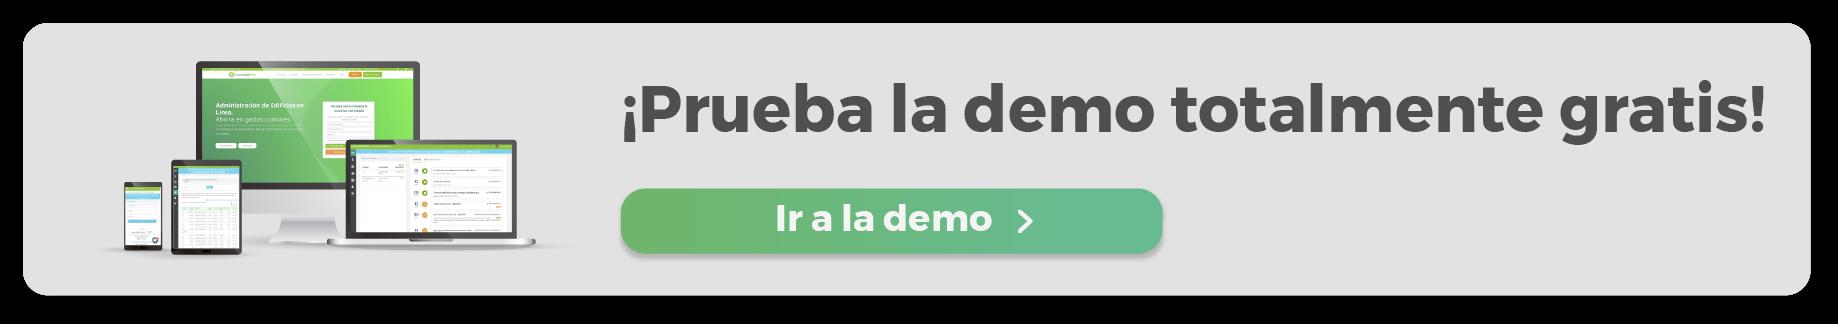 https://www.comunidadfeliz.cl/?utm_source=blog&utm_medium=nota&utm_campaign=covid19_protocolo_edificios